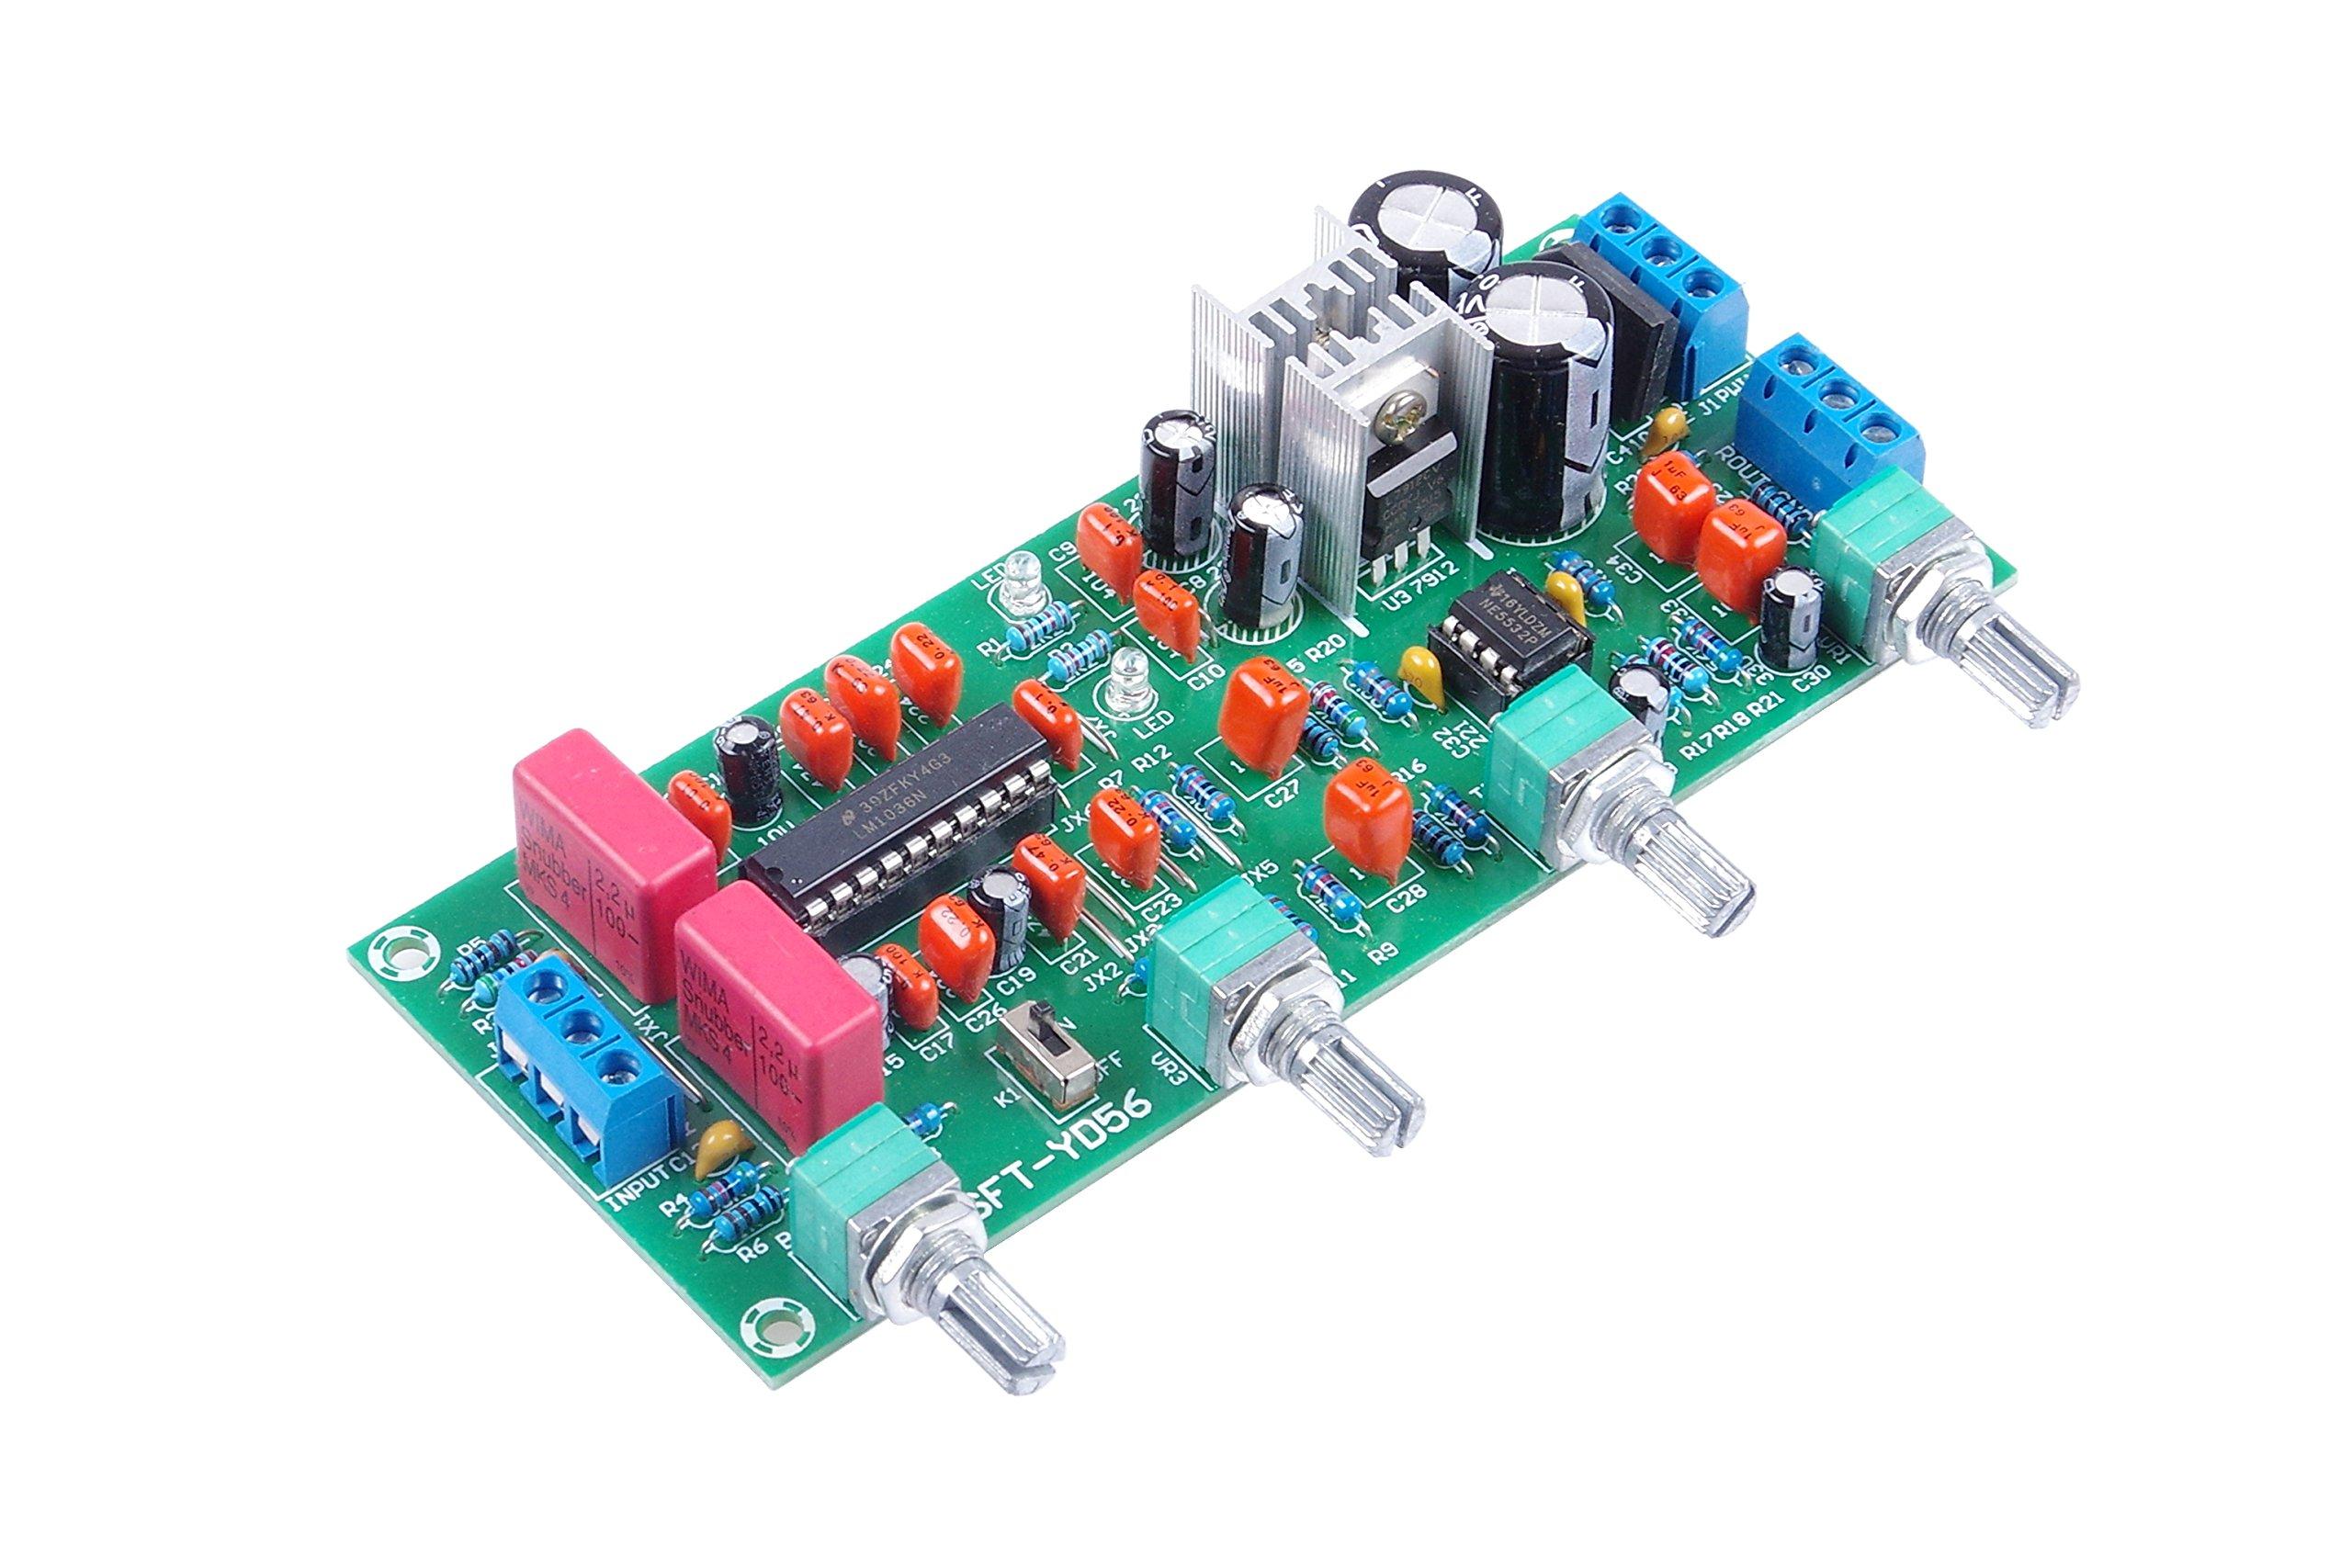 50Pcs NE5532 N5532 SOP-8 SMD Dual Low Noise Op-Amp TI IC UK